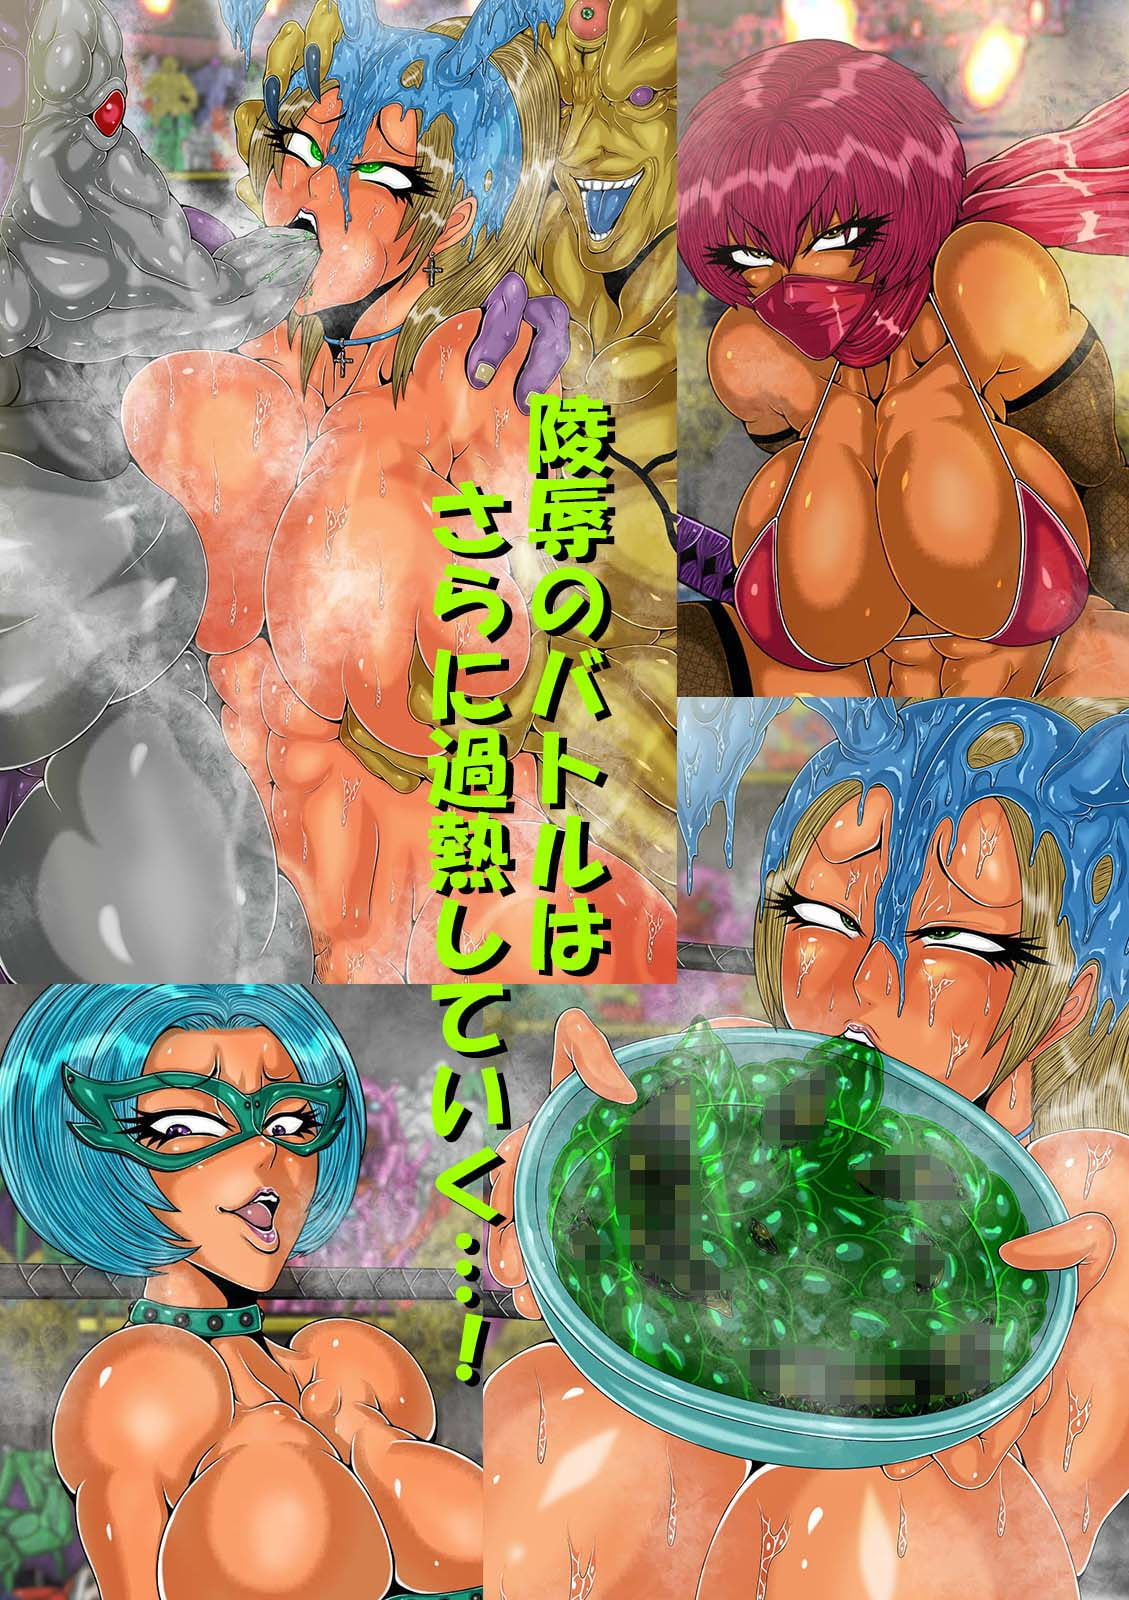 QUEEN HEAVEN HELLS GATE Vol.2 ゲノム編